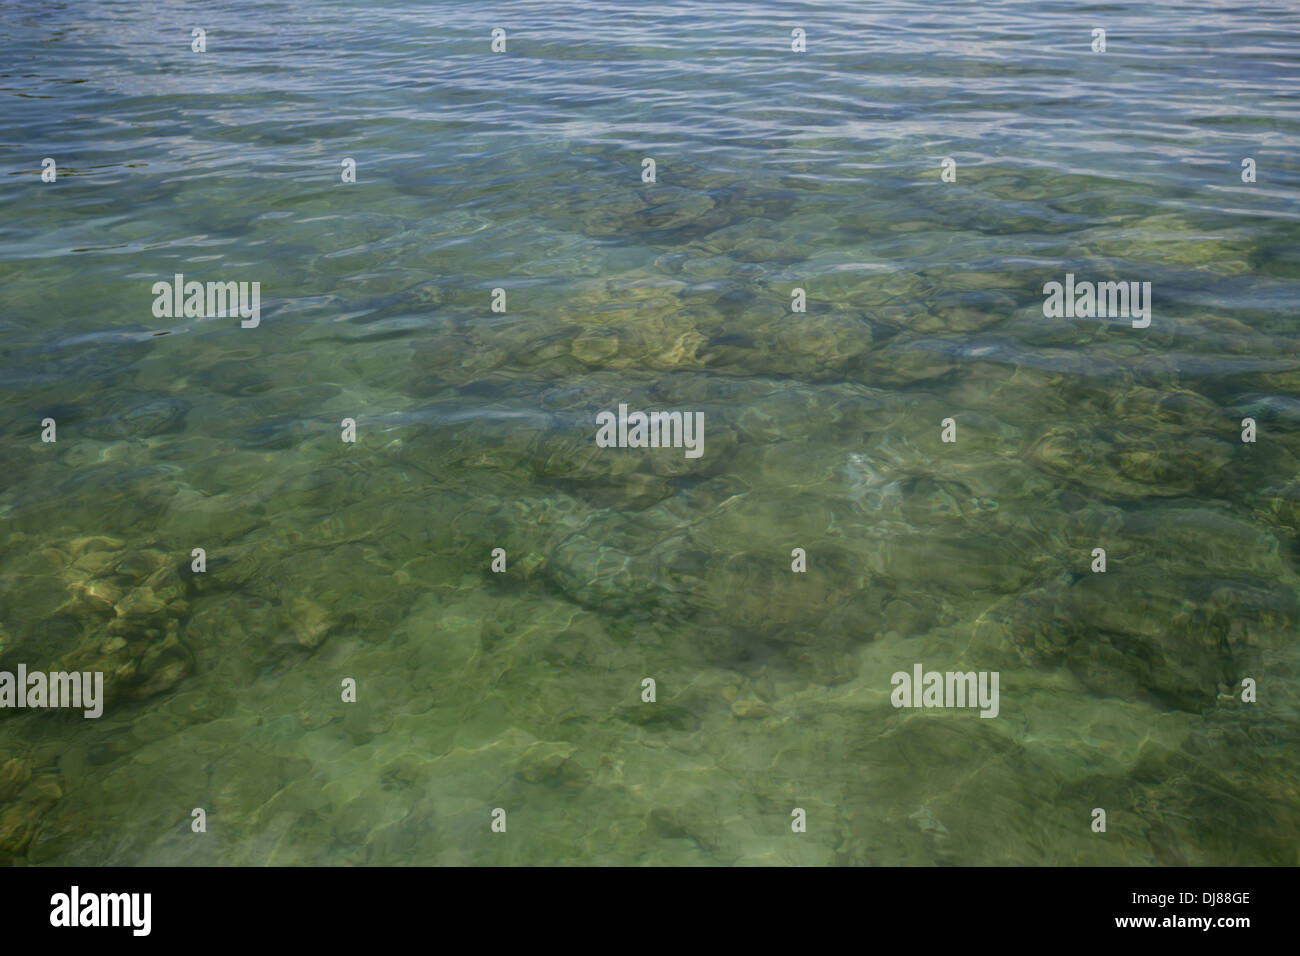 Andaman sea, Jolly Buoy beach, Andaman Islands, India - Stock Image